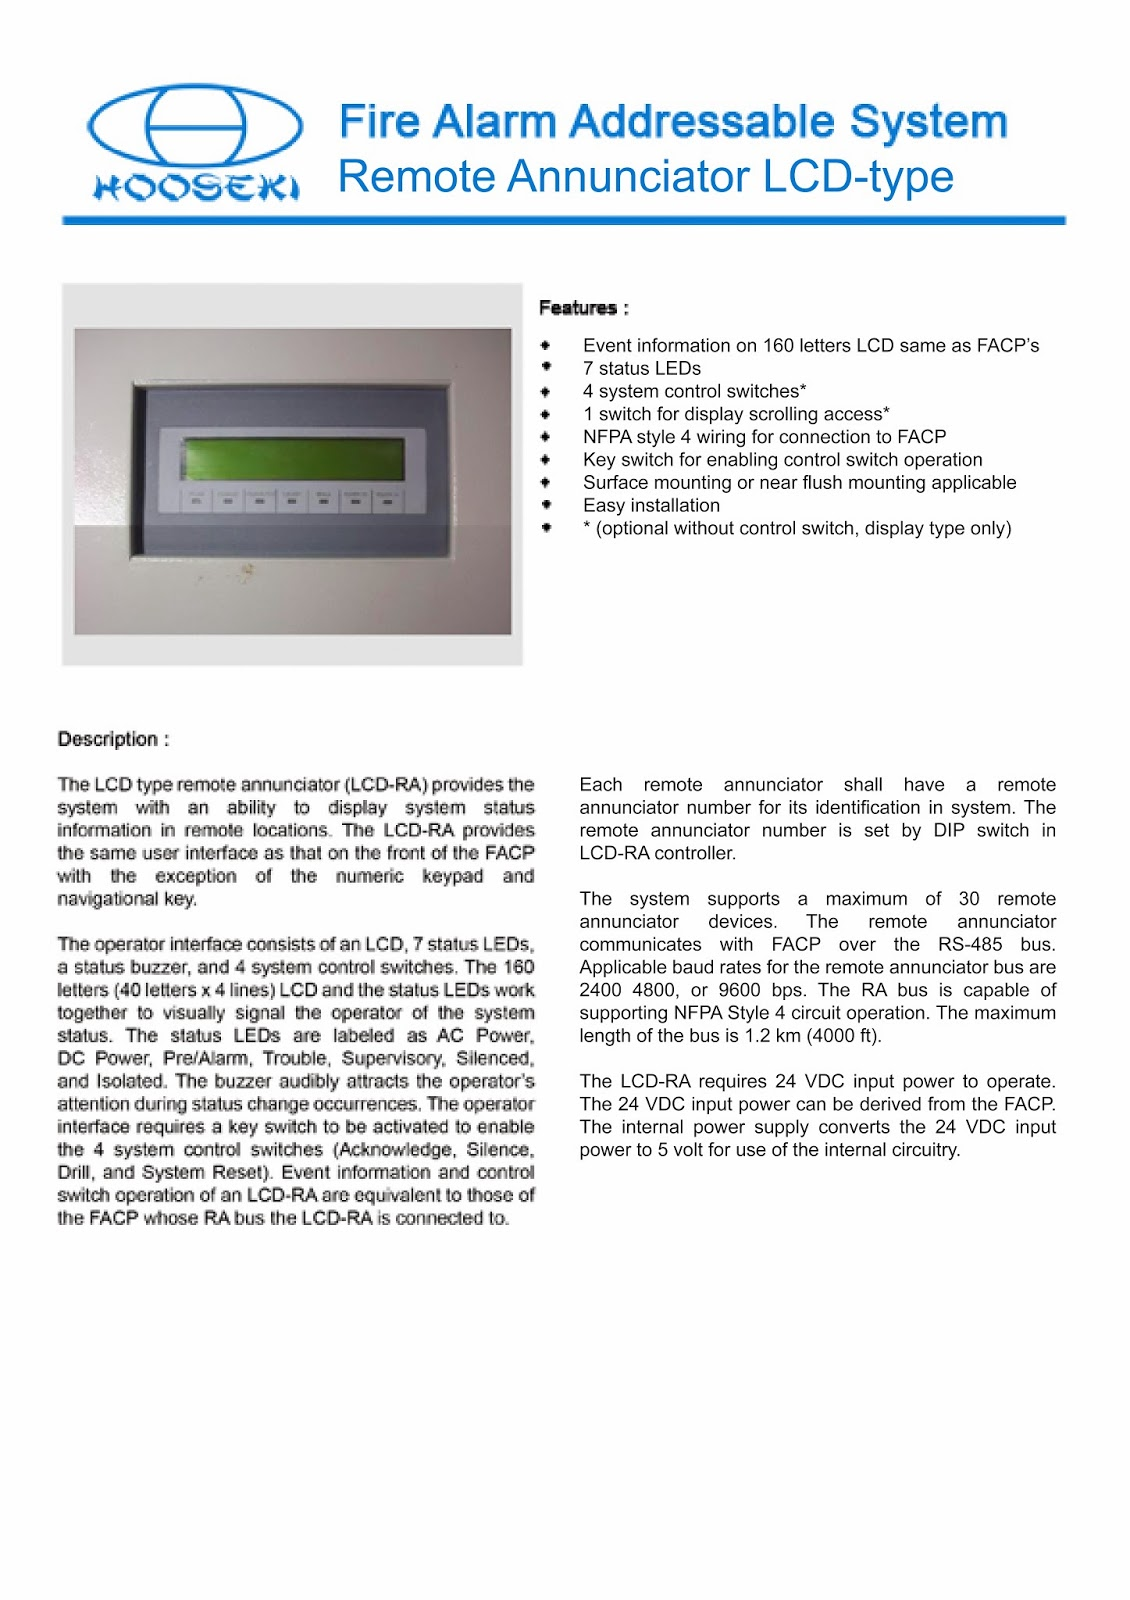 Nohmi besides Fire Pump additionally Australia Standard Addressable Fire Alarm System 60196363104 in addition Mcfa Secutron 1 Loop 159 Address also Notifier Harga Semi Addressable Fire Alarm. on addressable fire alarm system hooseki